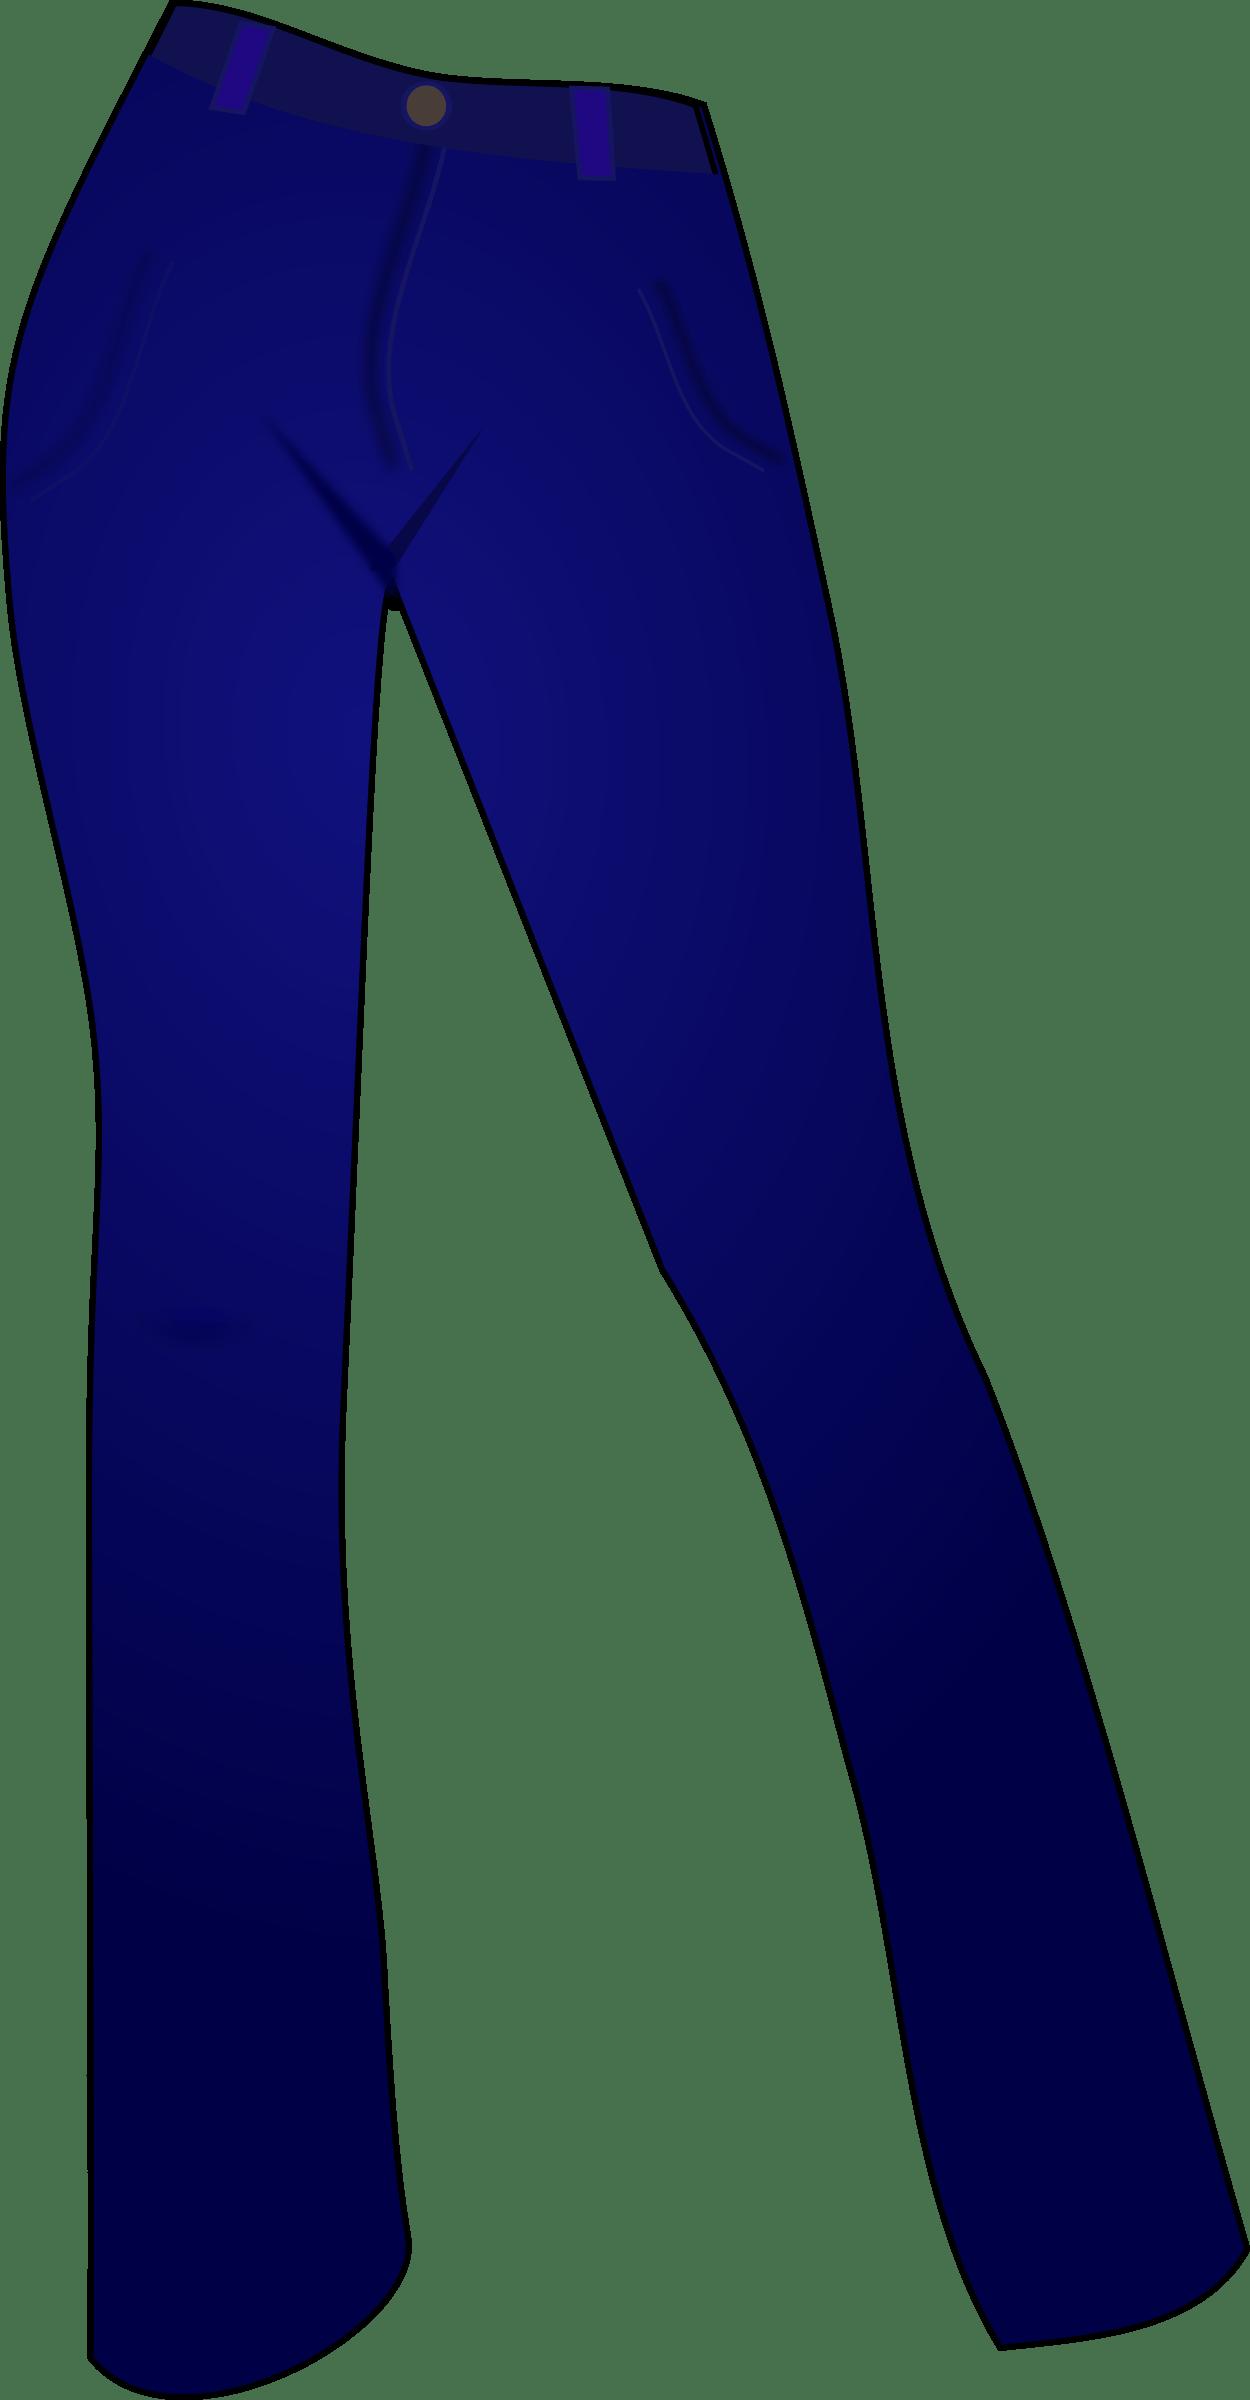 Blue jean clipart 2 » Clipart Portal.